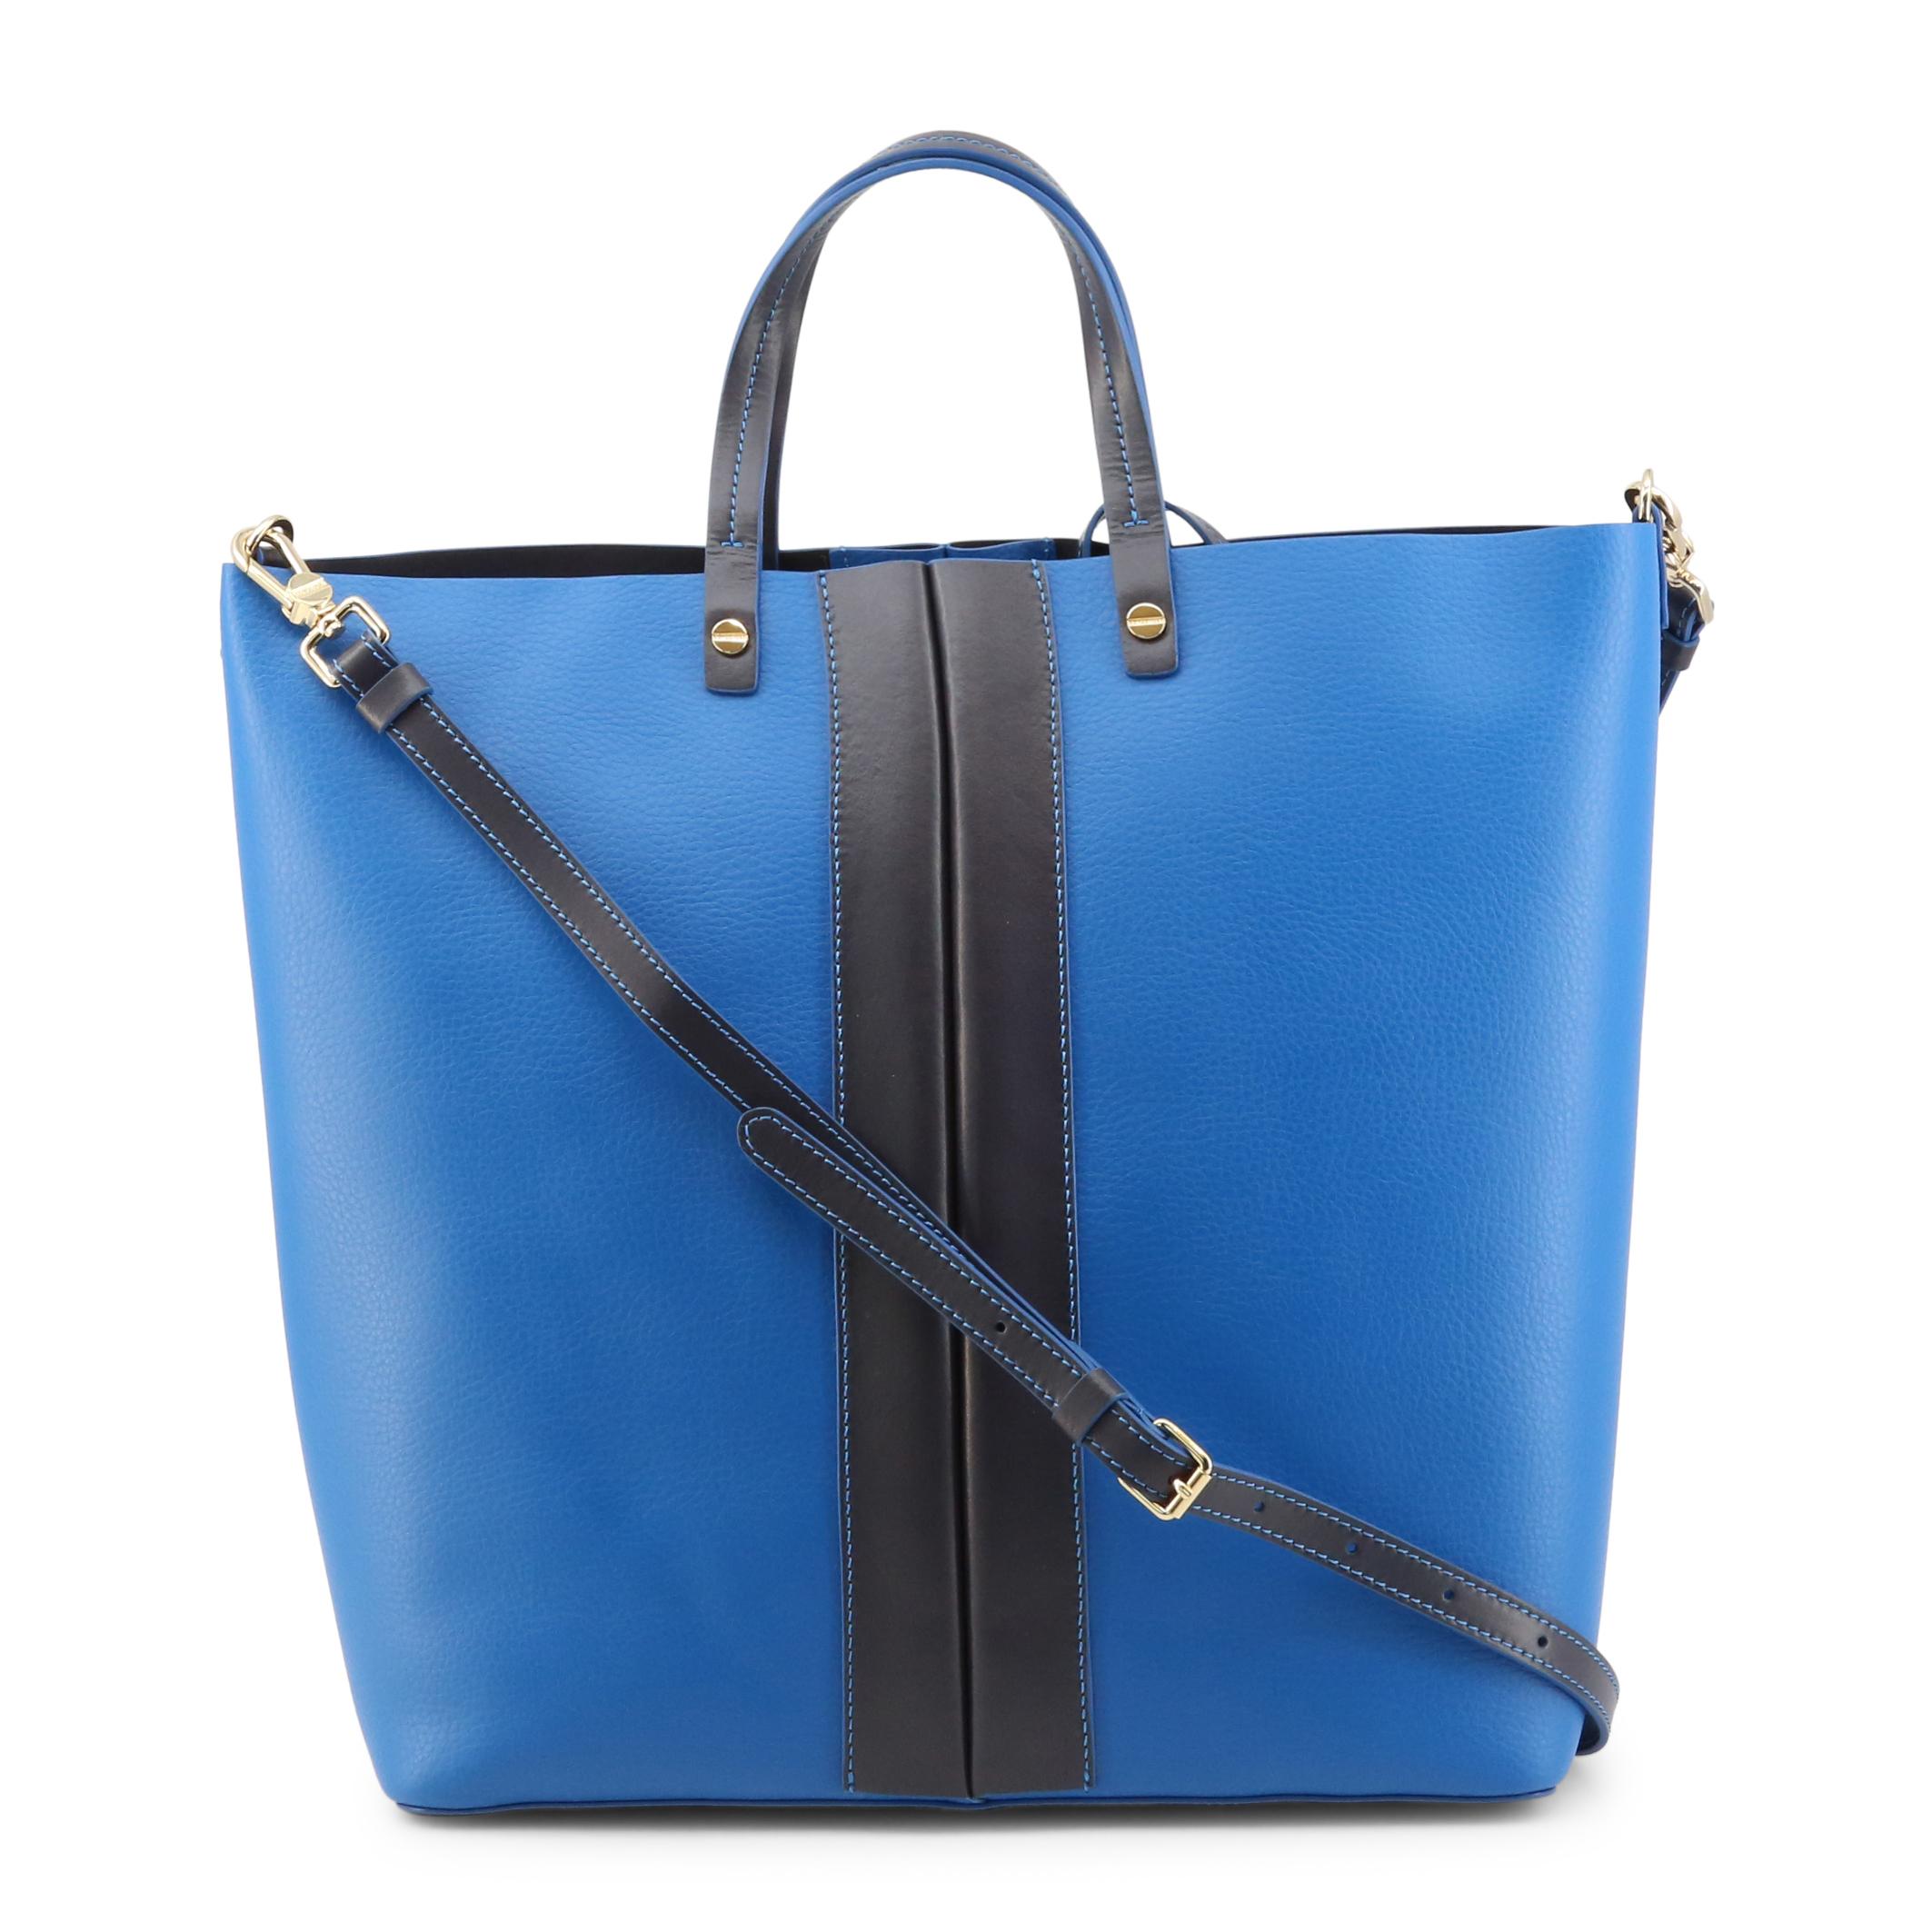 Borbonese - 903840-J61 - Blue